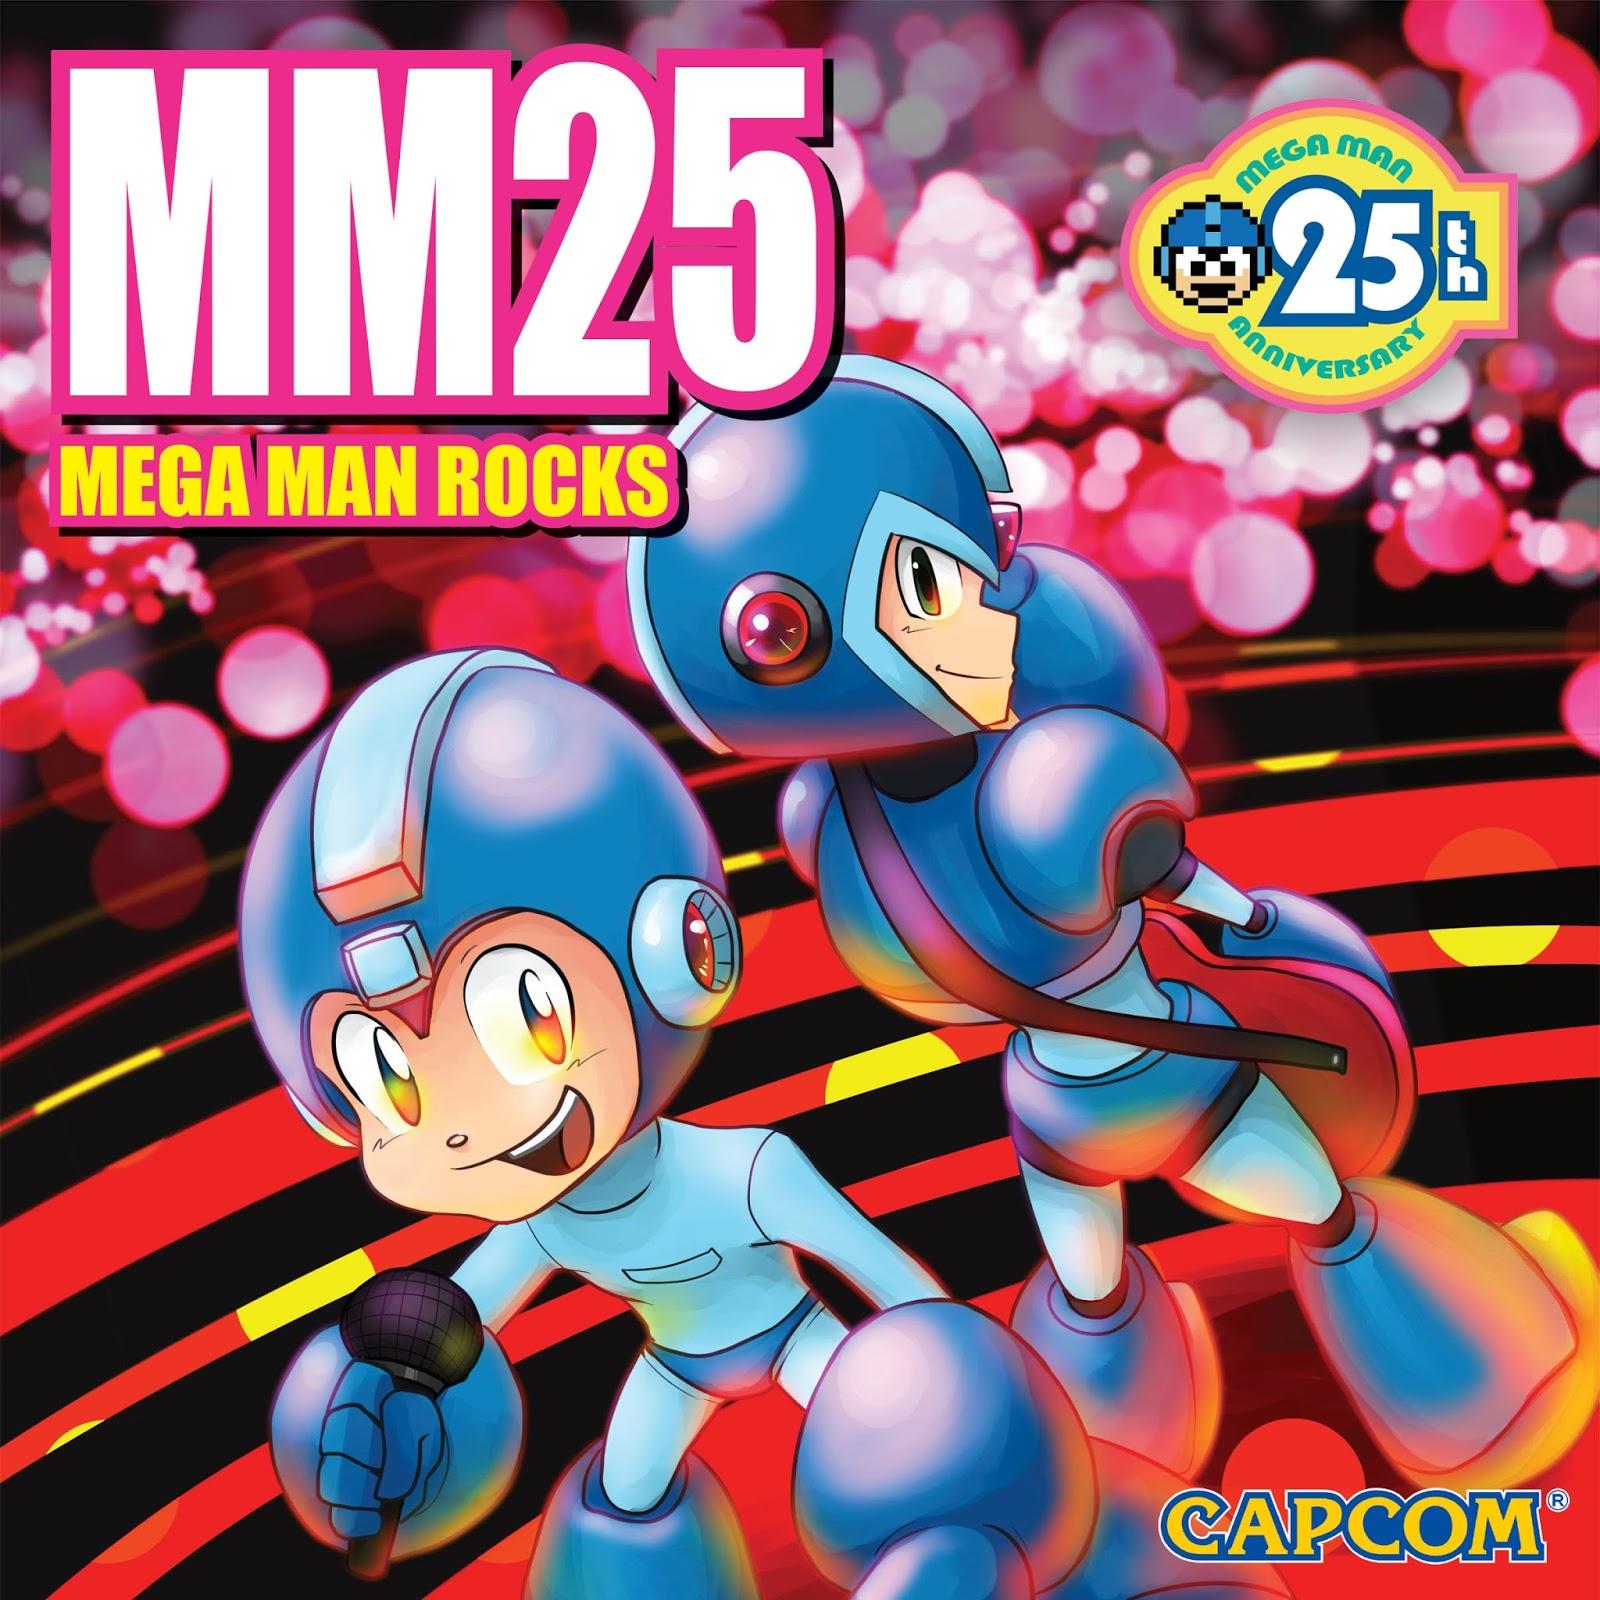 Rockman music mm25 mega man rocks for Megaman 9 portada